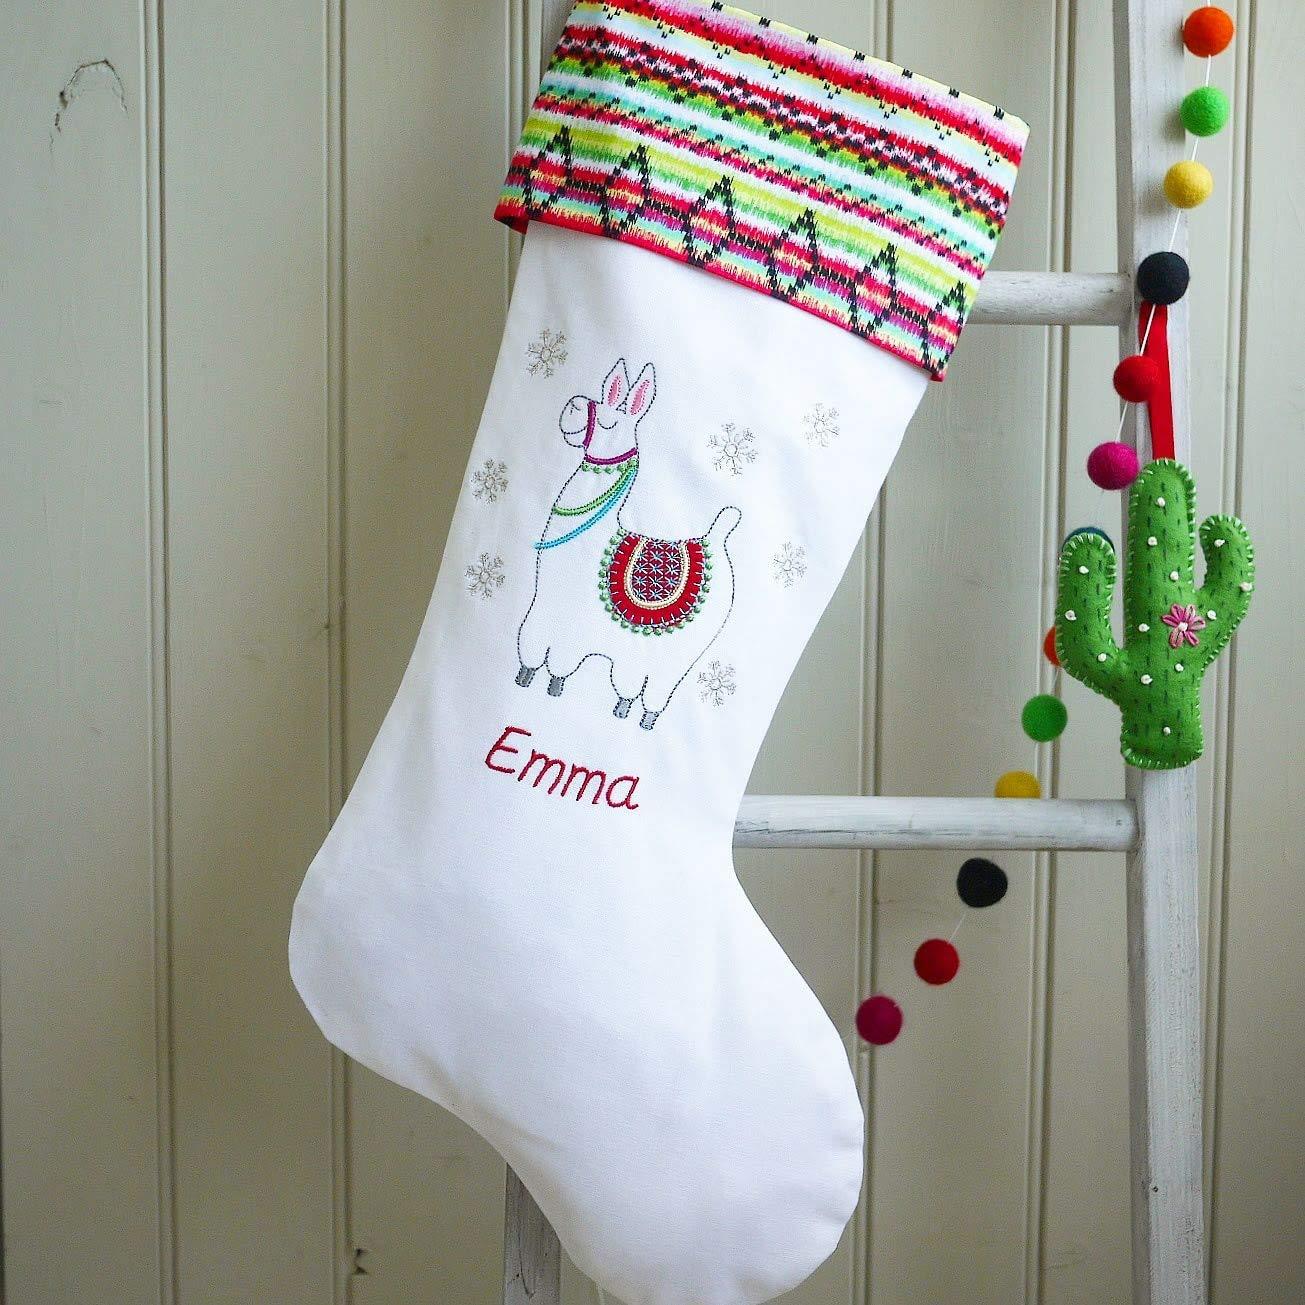 Llama Christmas Stocking.Llama Christmas Stocking Personalised Christmas Stockings